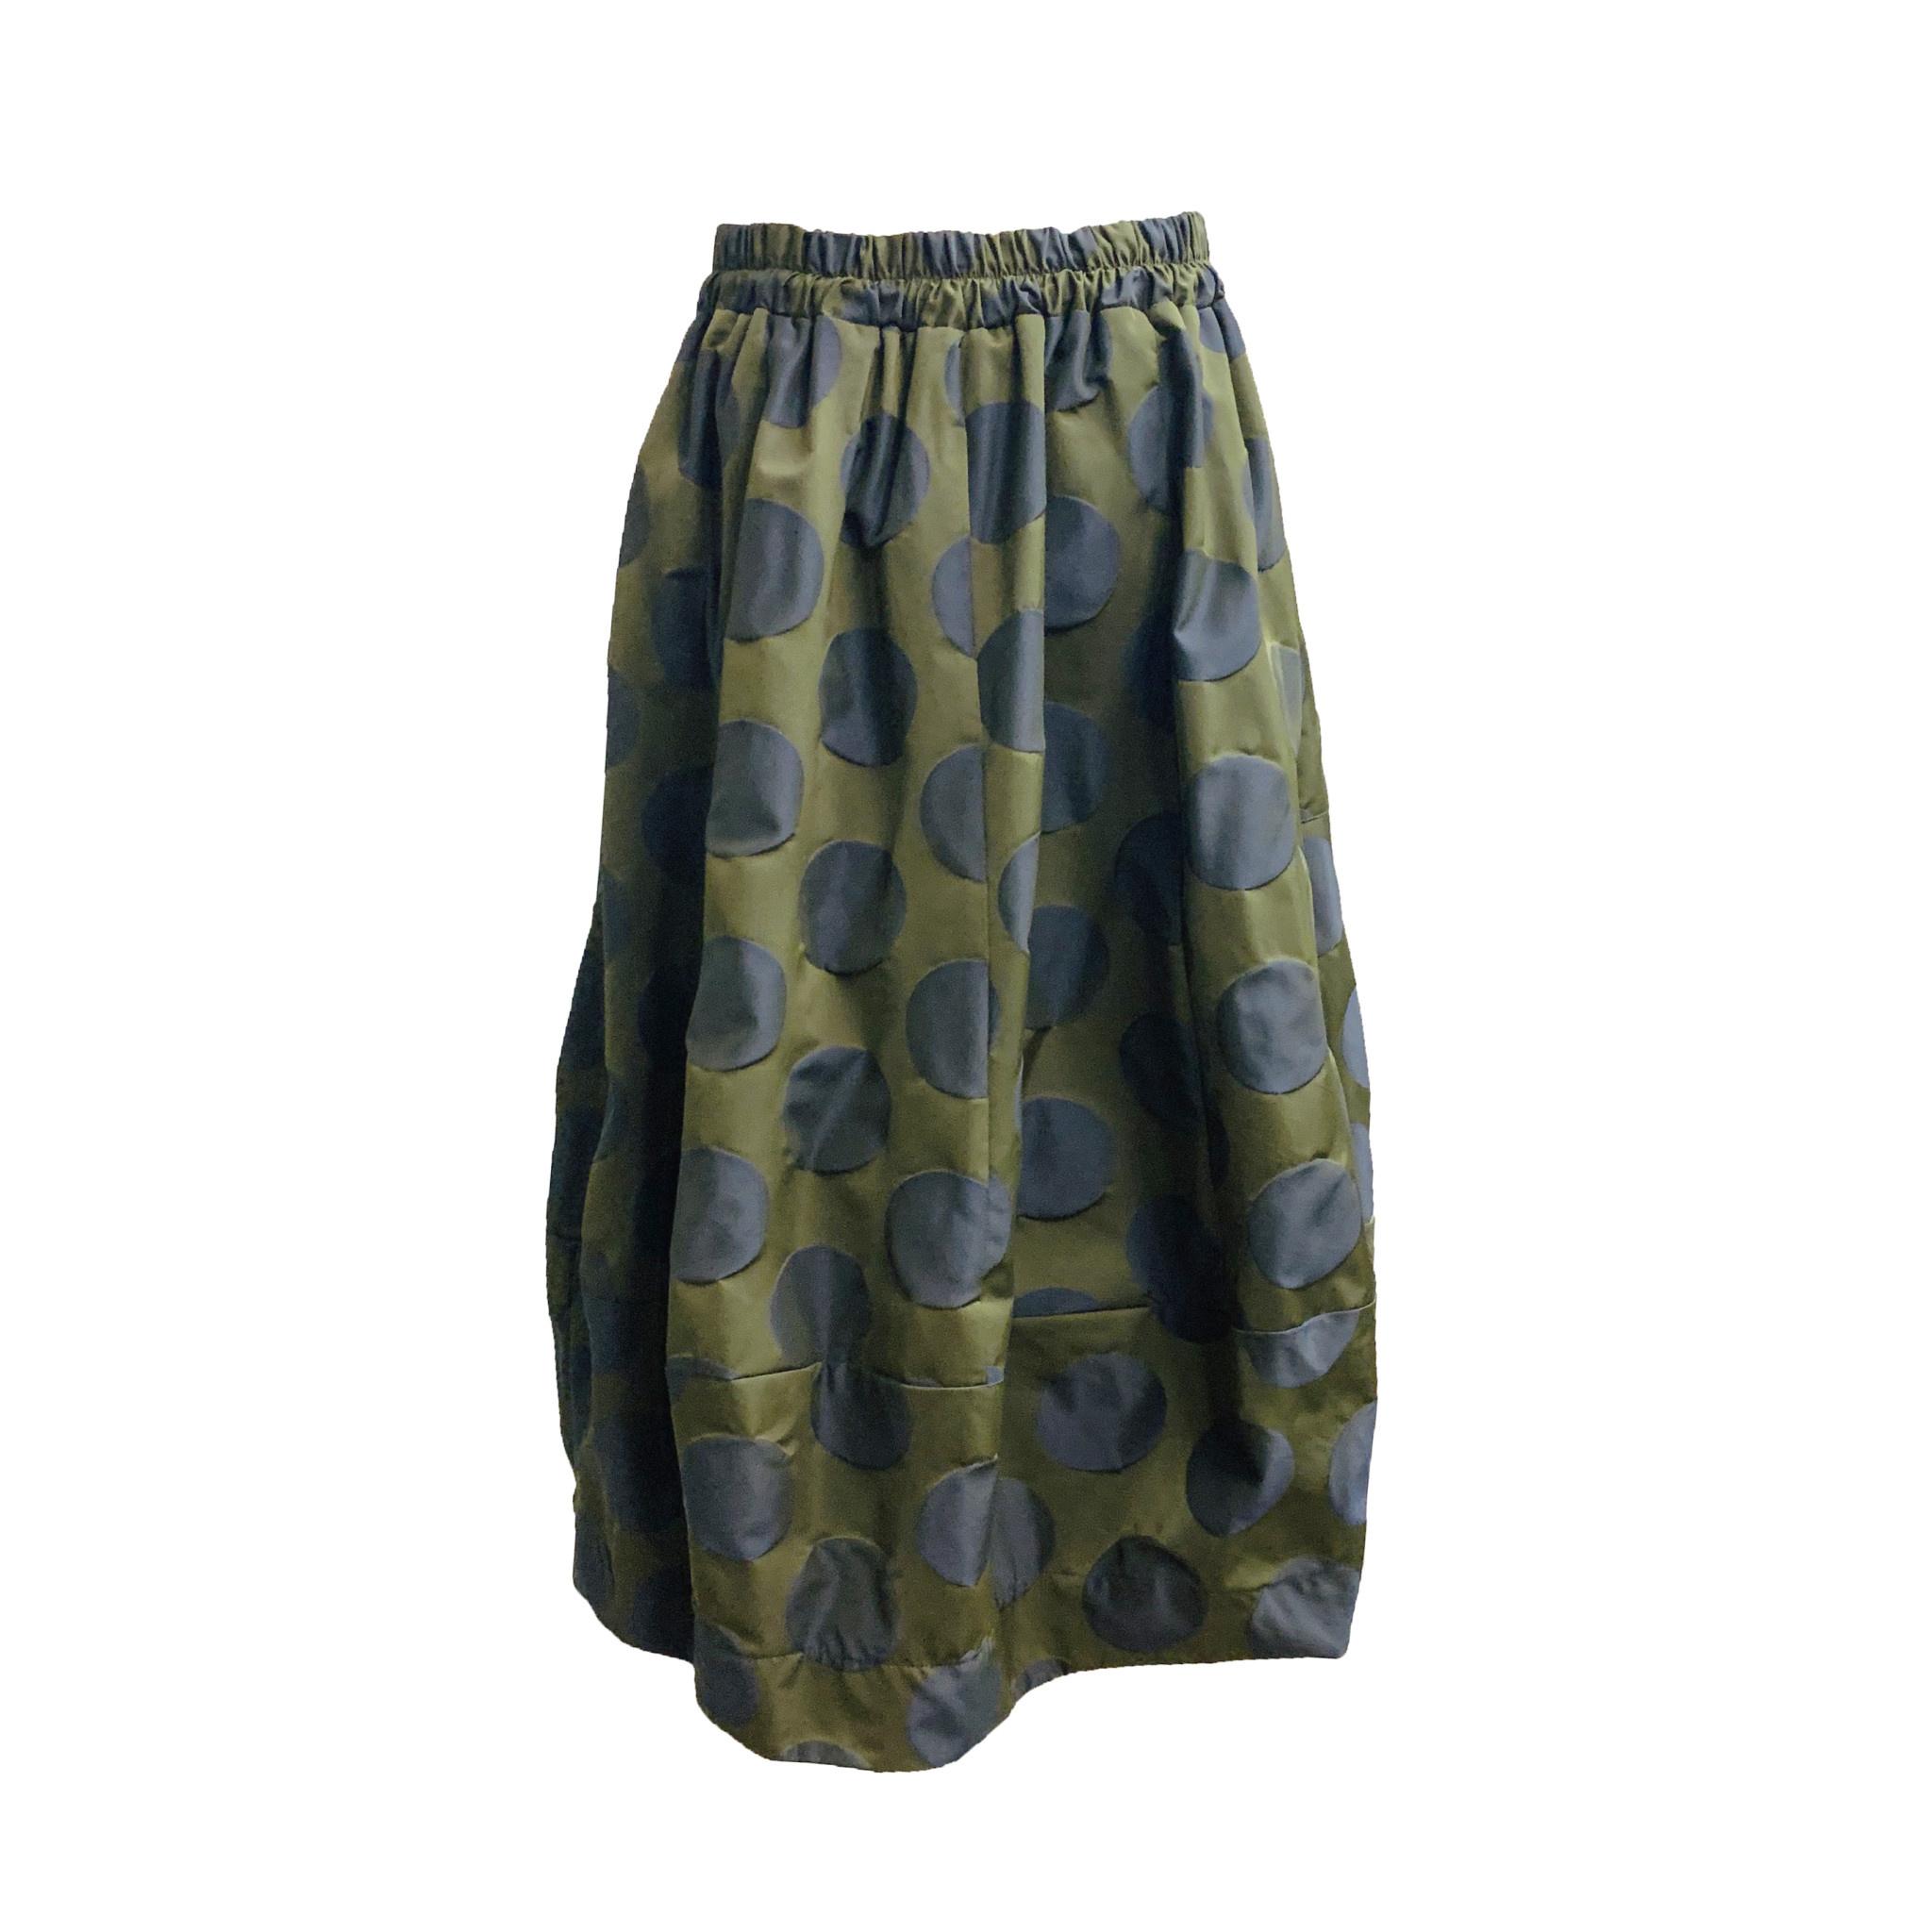 Sun Kim Sun Kim Midtown Skirt - Navy Dot